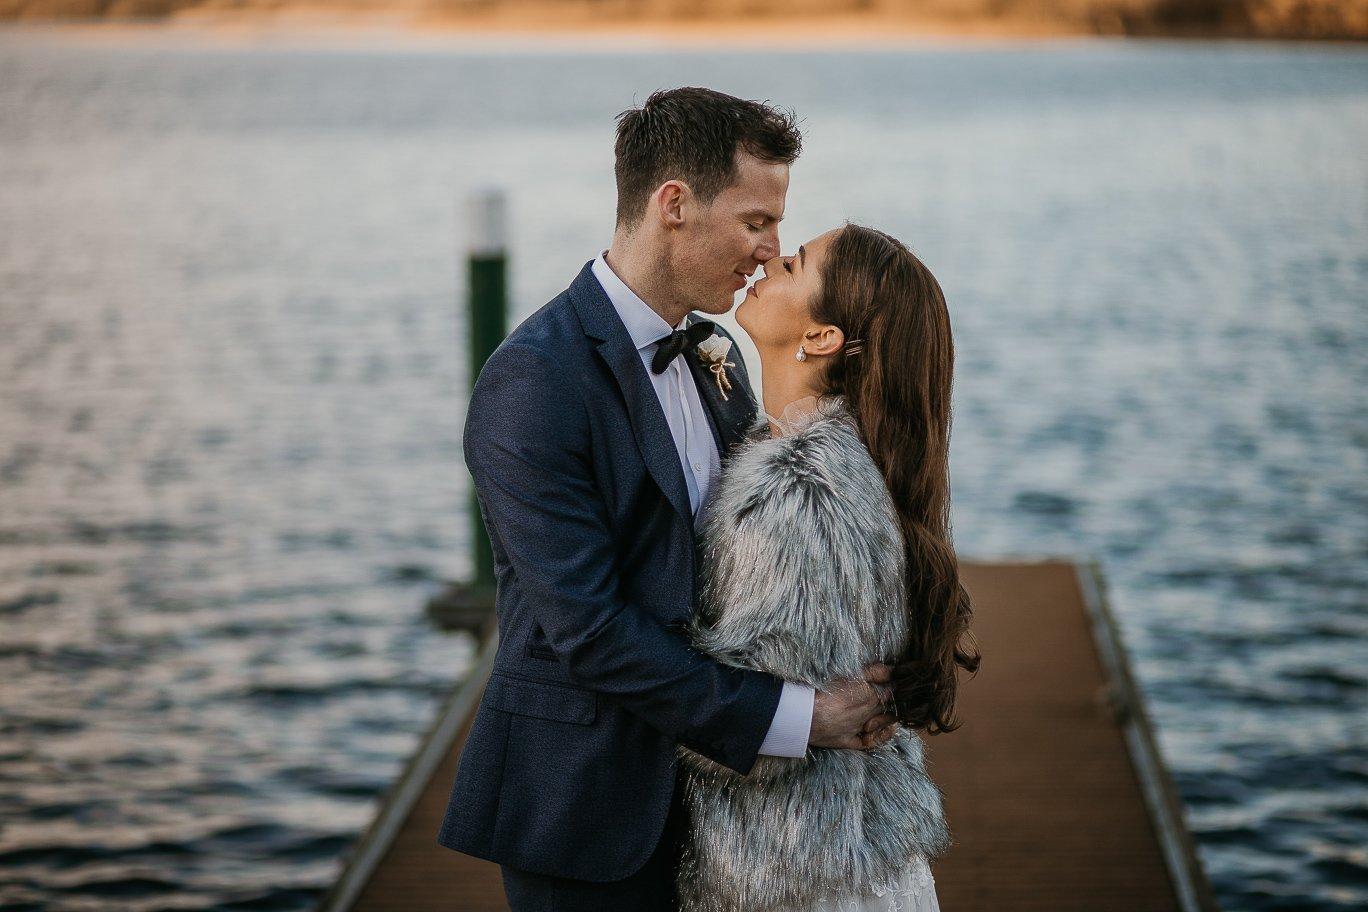 Darren Byrne - bride and groom kissing in a real wedding at Kilronan Castle